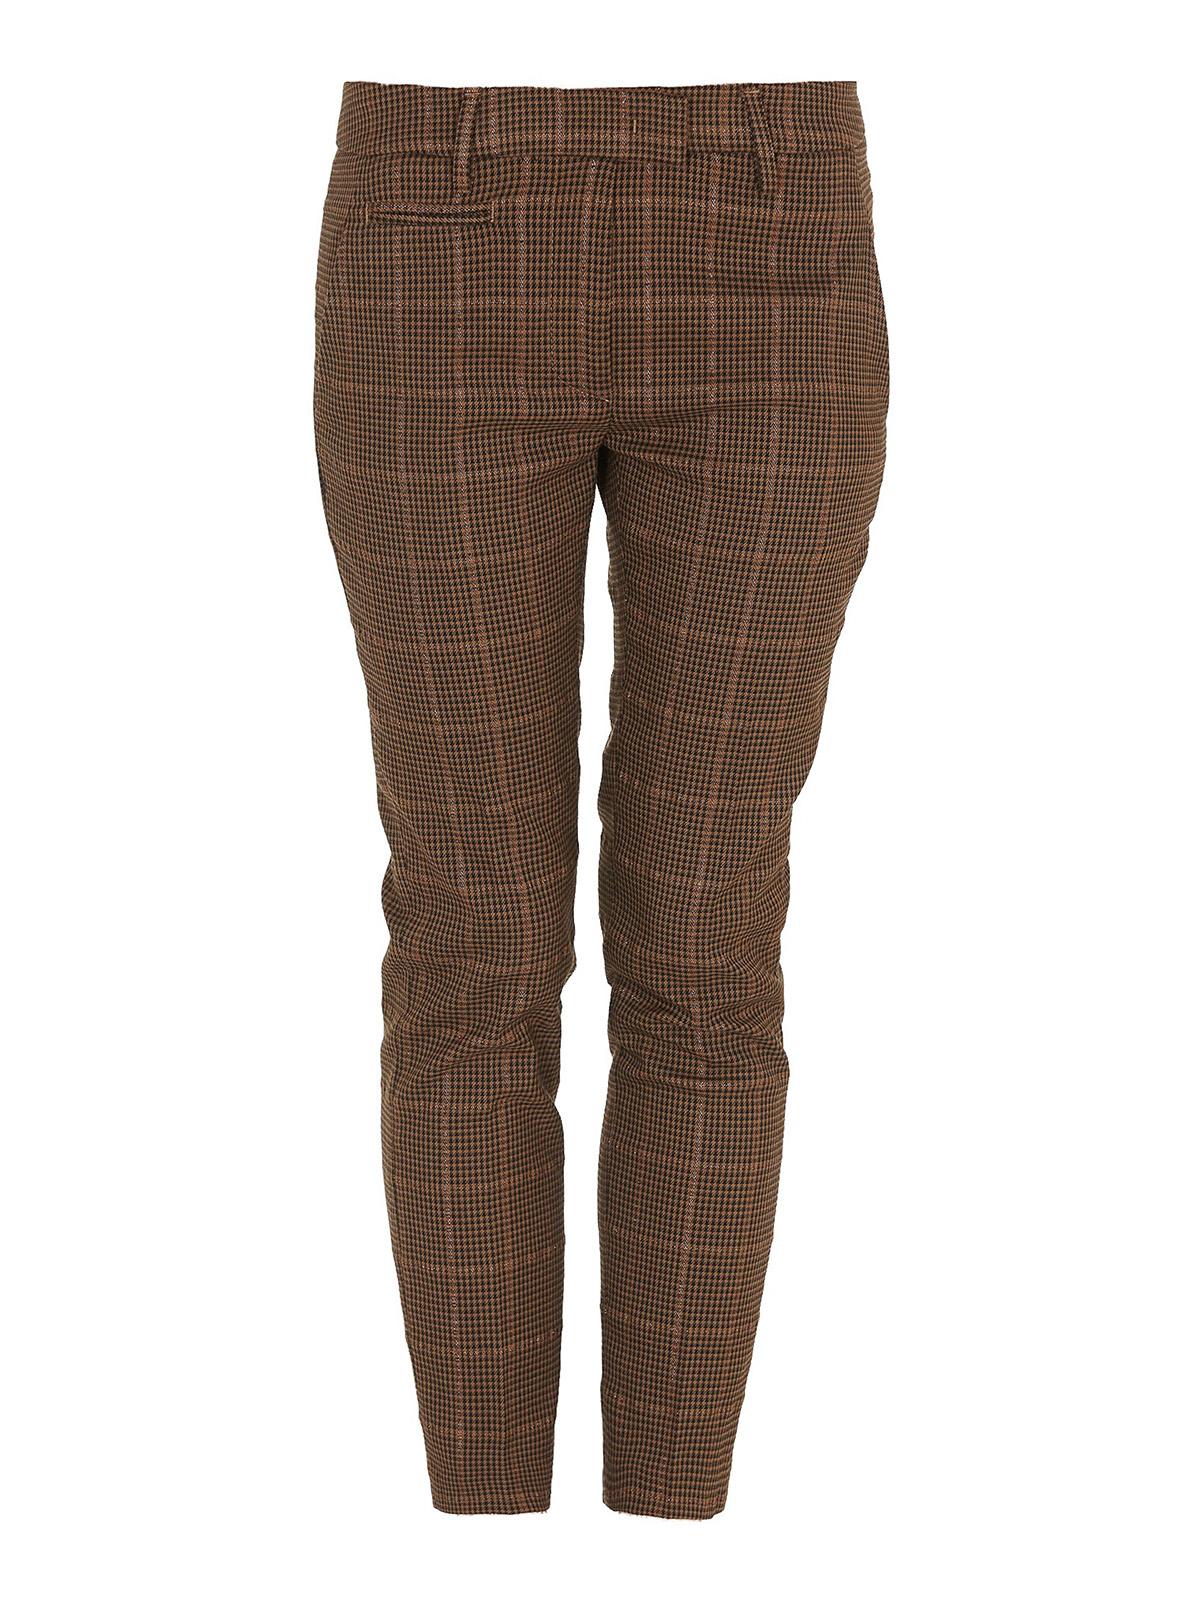 Dondup LUREX PRINCE OF WALES PATTERNED PANTS